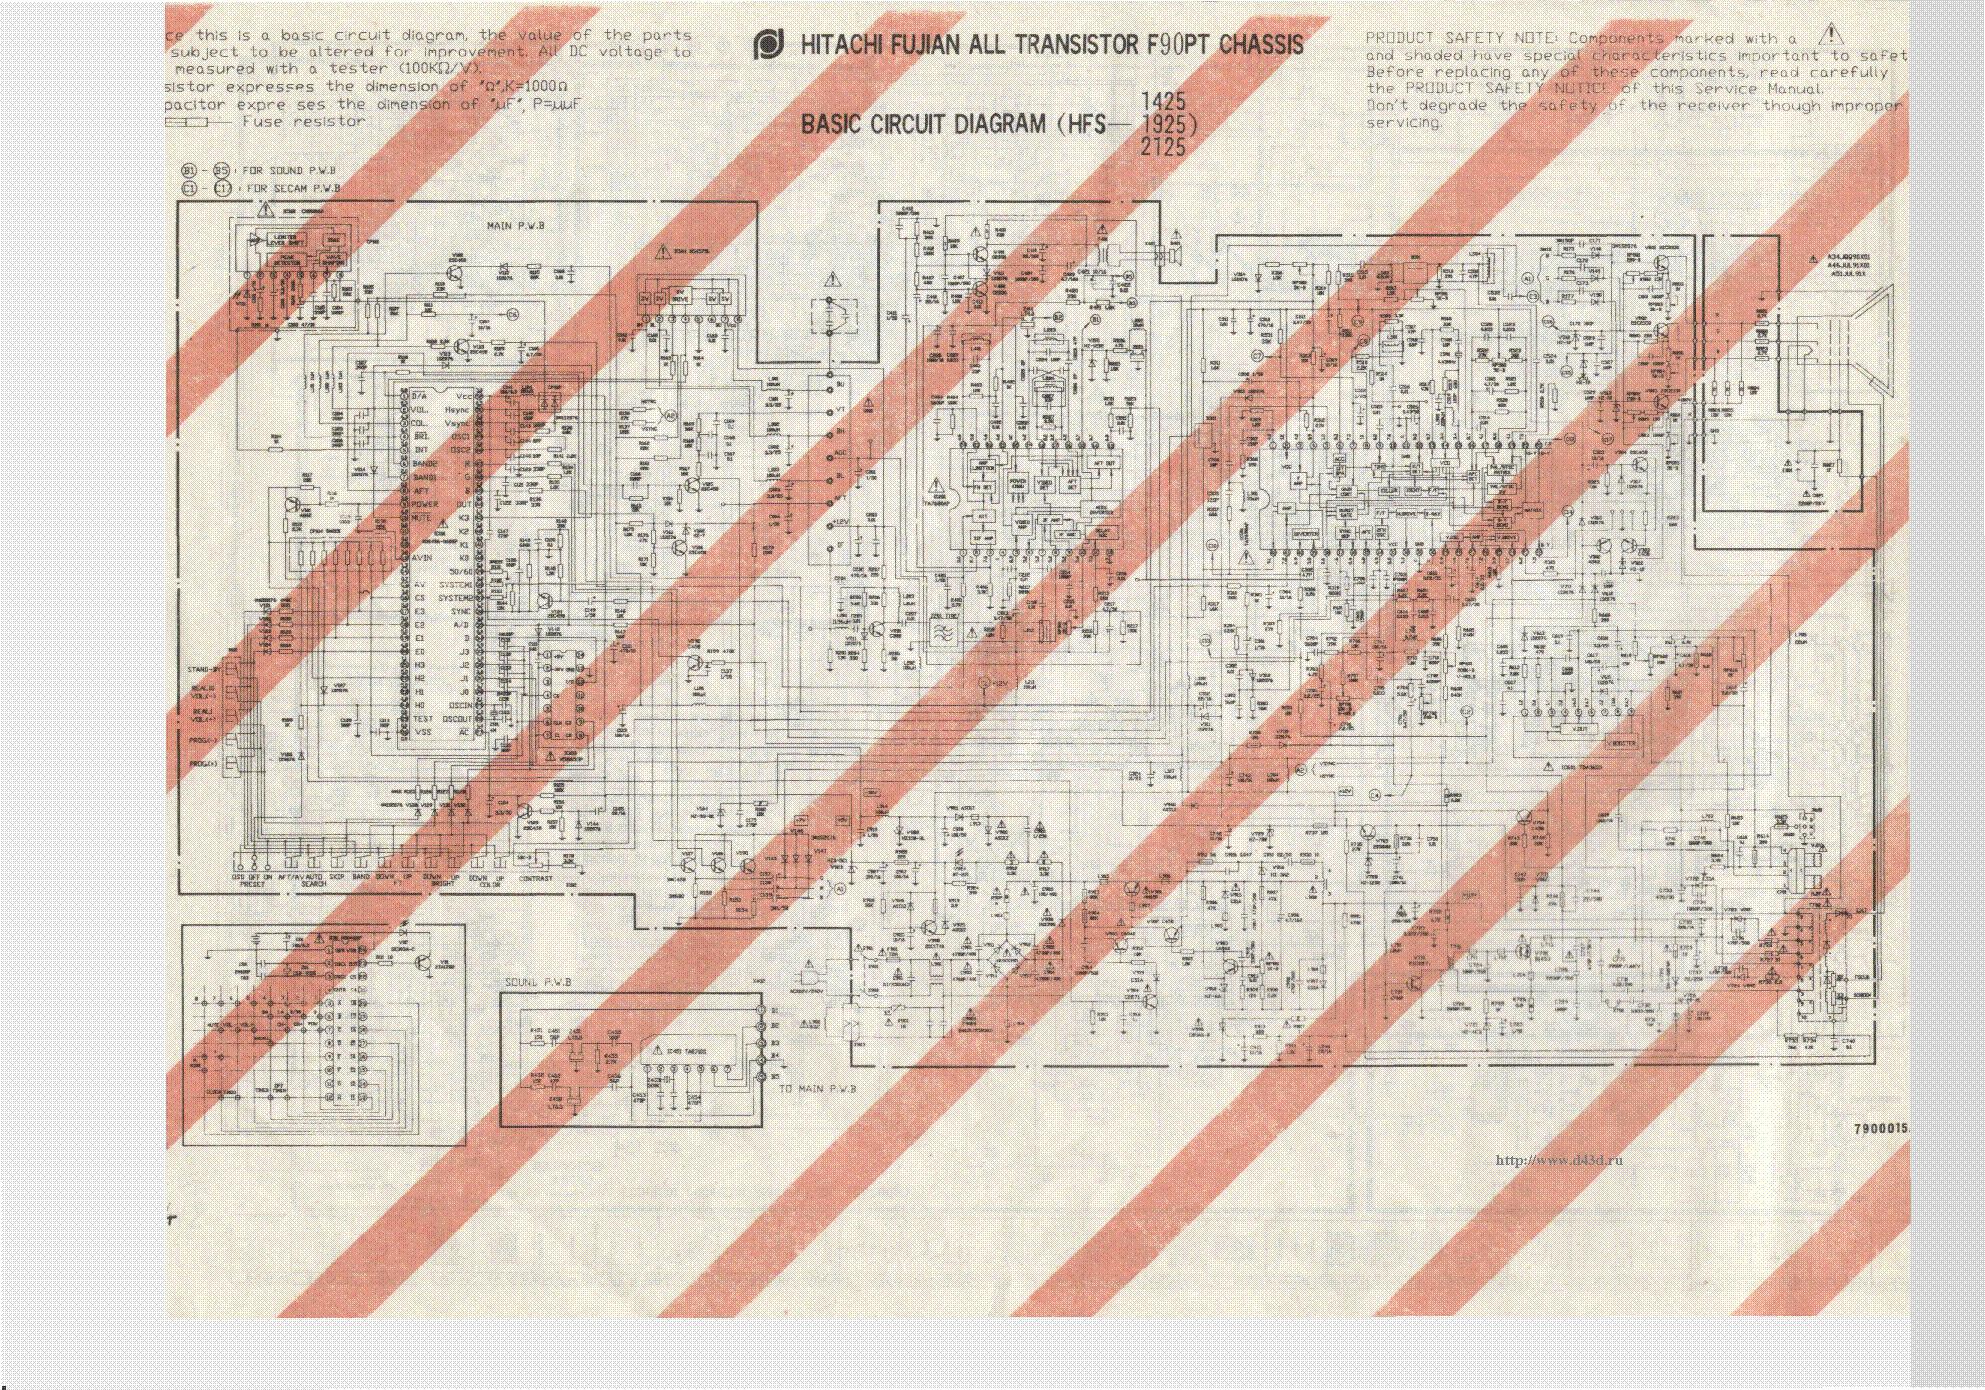 Hitachi Hfc Vwe Wiring Diagram Free Download Modem Schematics Fujian 2125 Service Manual Eeprom